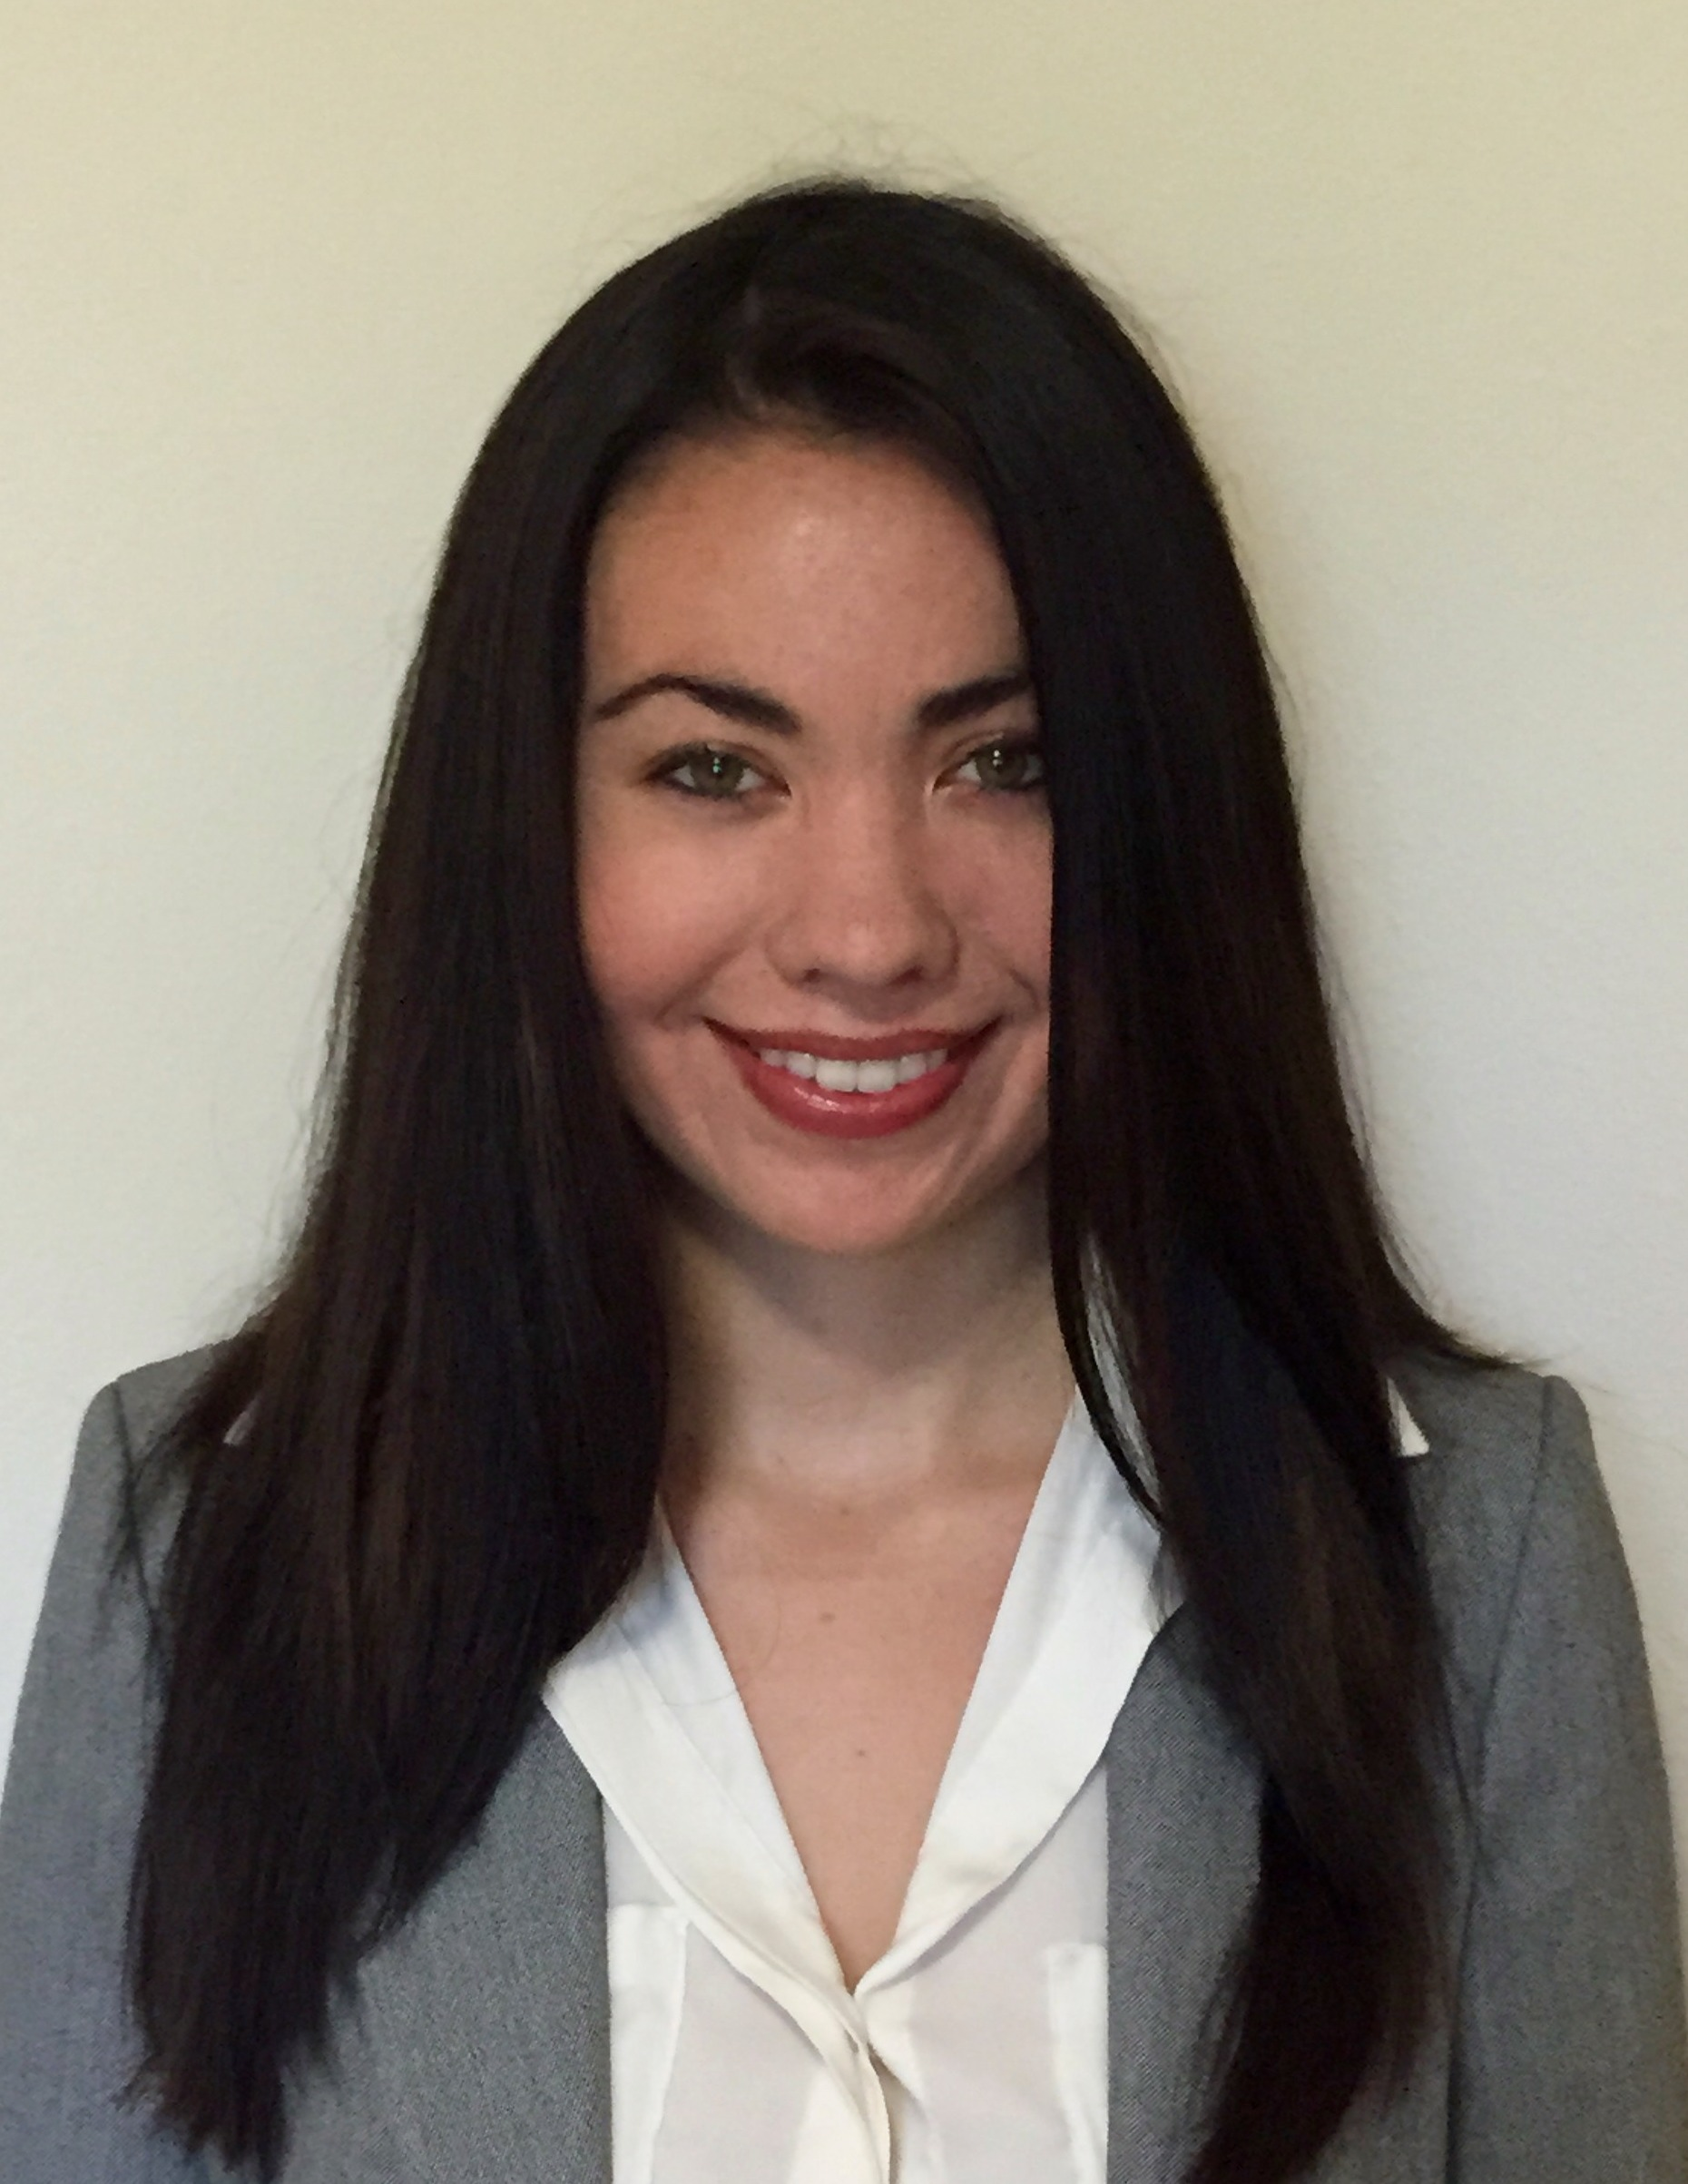 Kelly Cornett, Psy.D. : Neuropsychologist